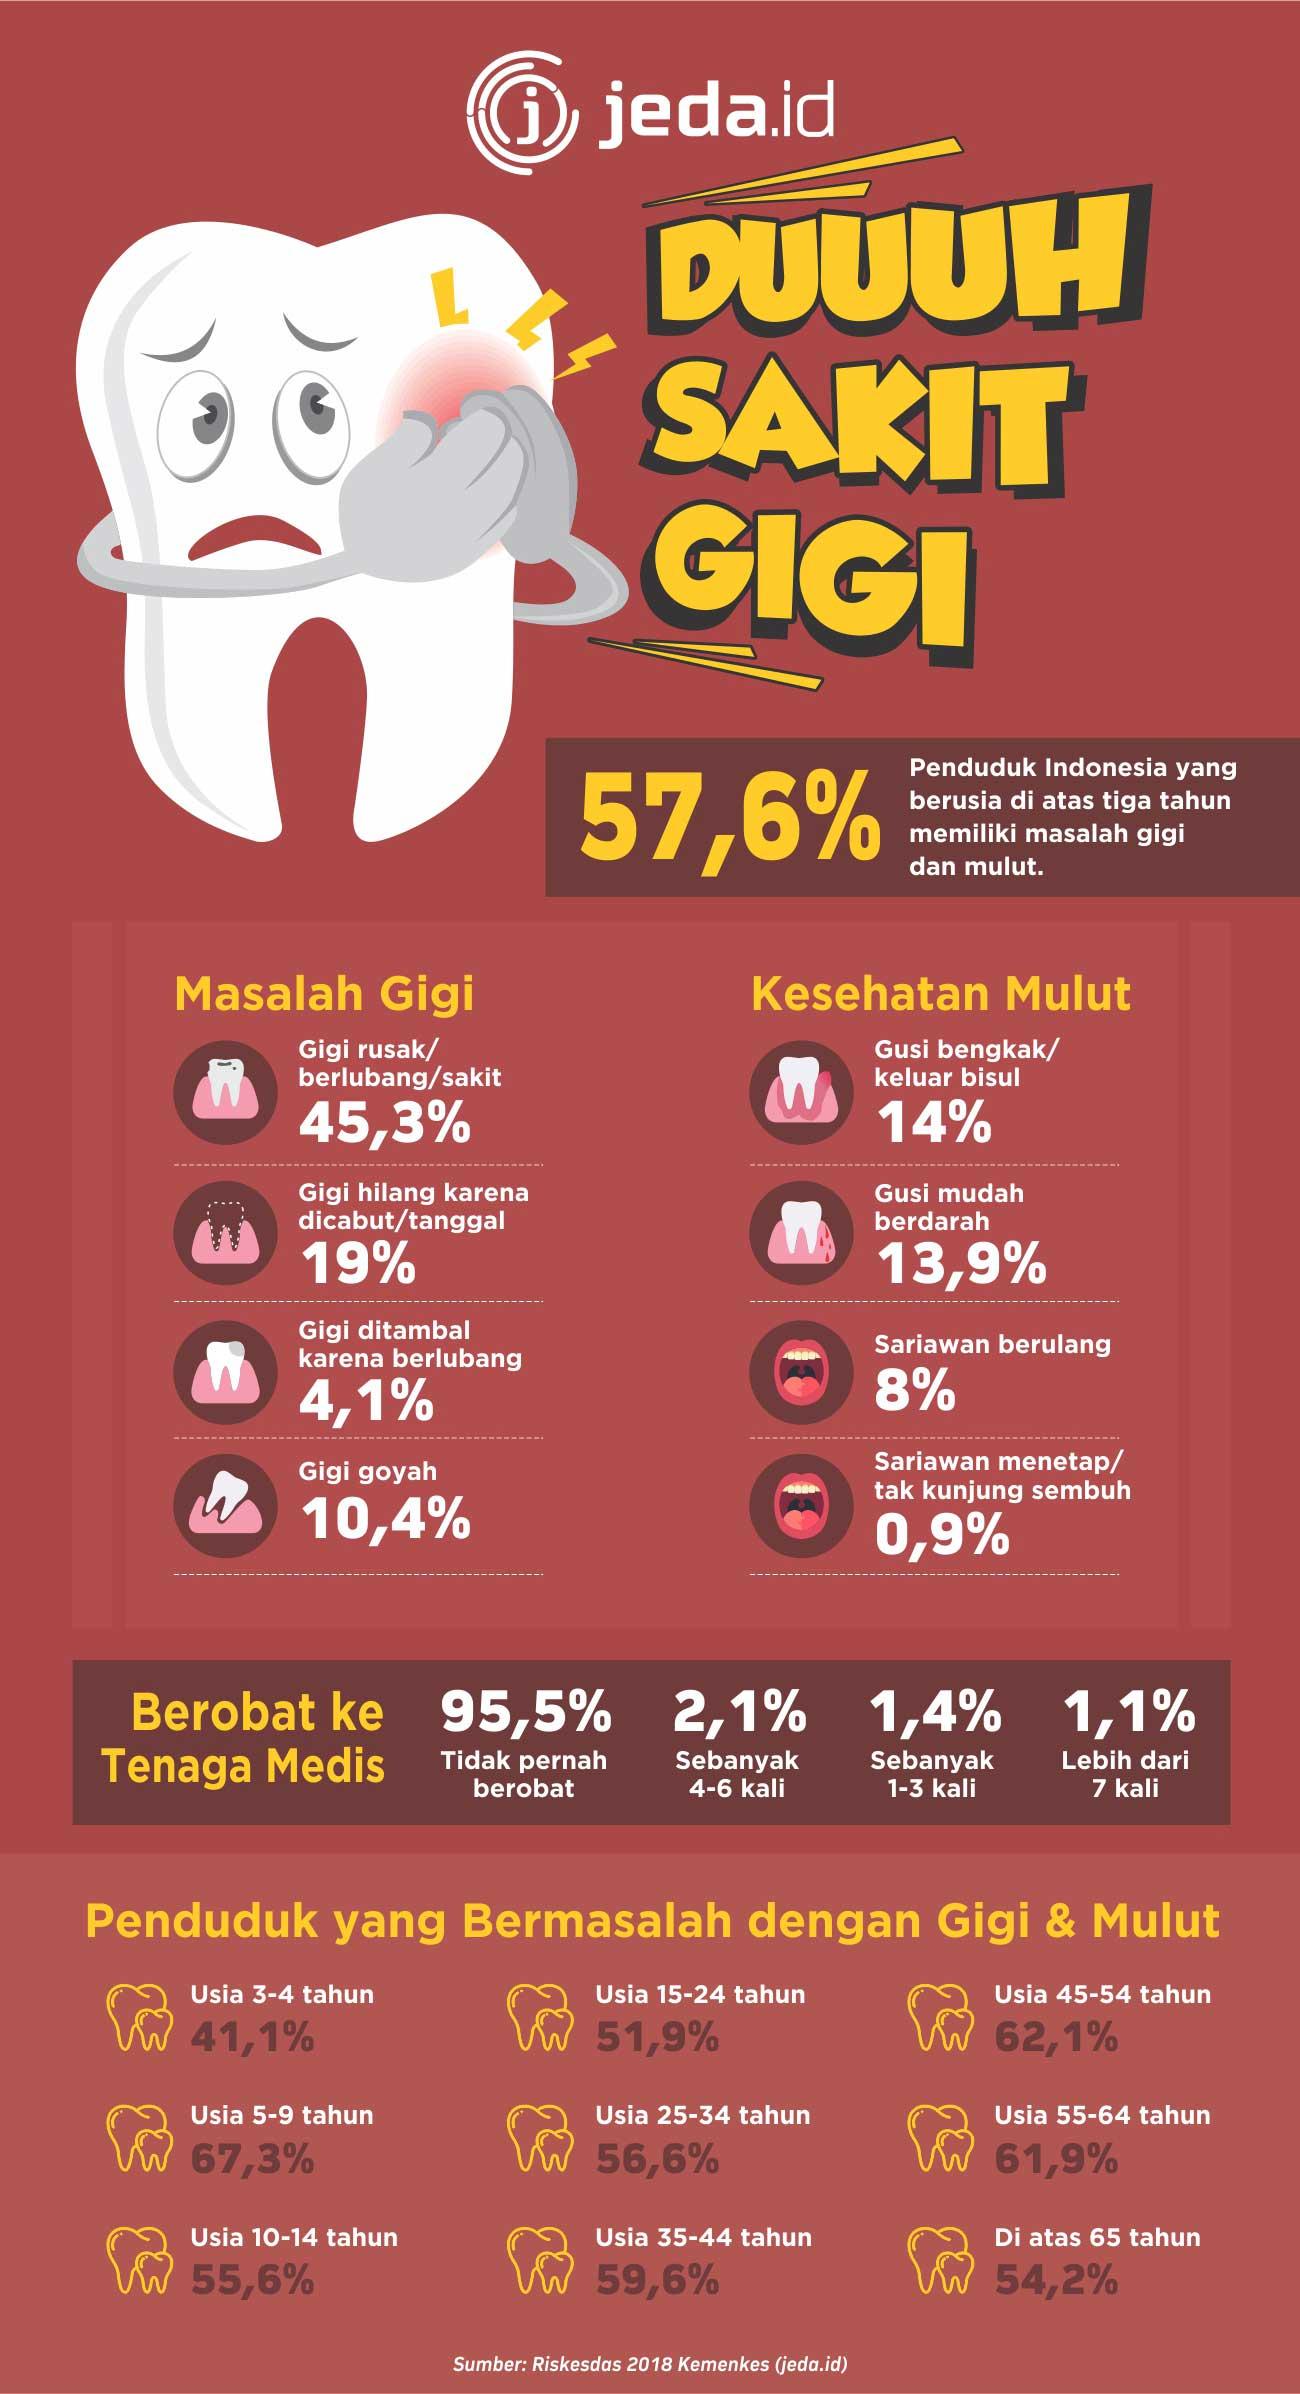 sakit gigi